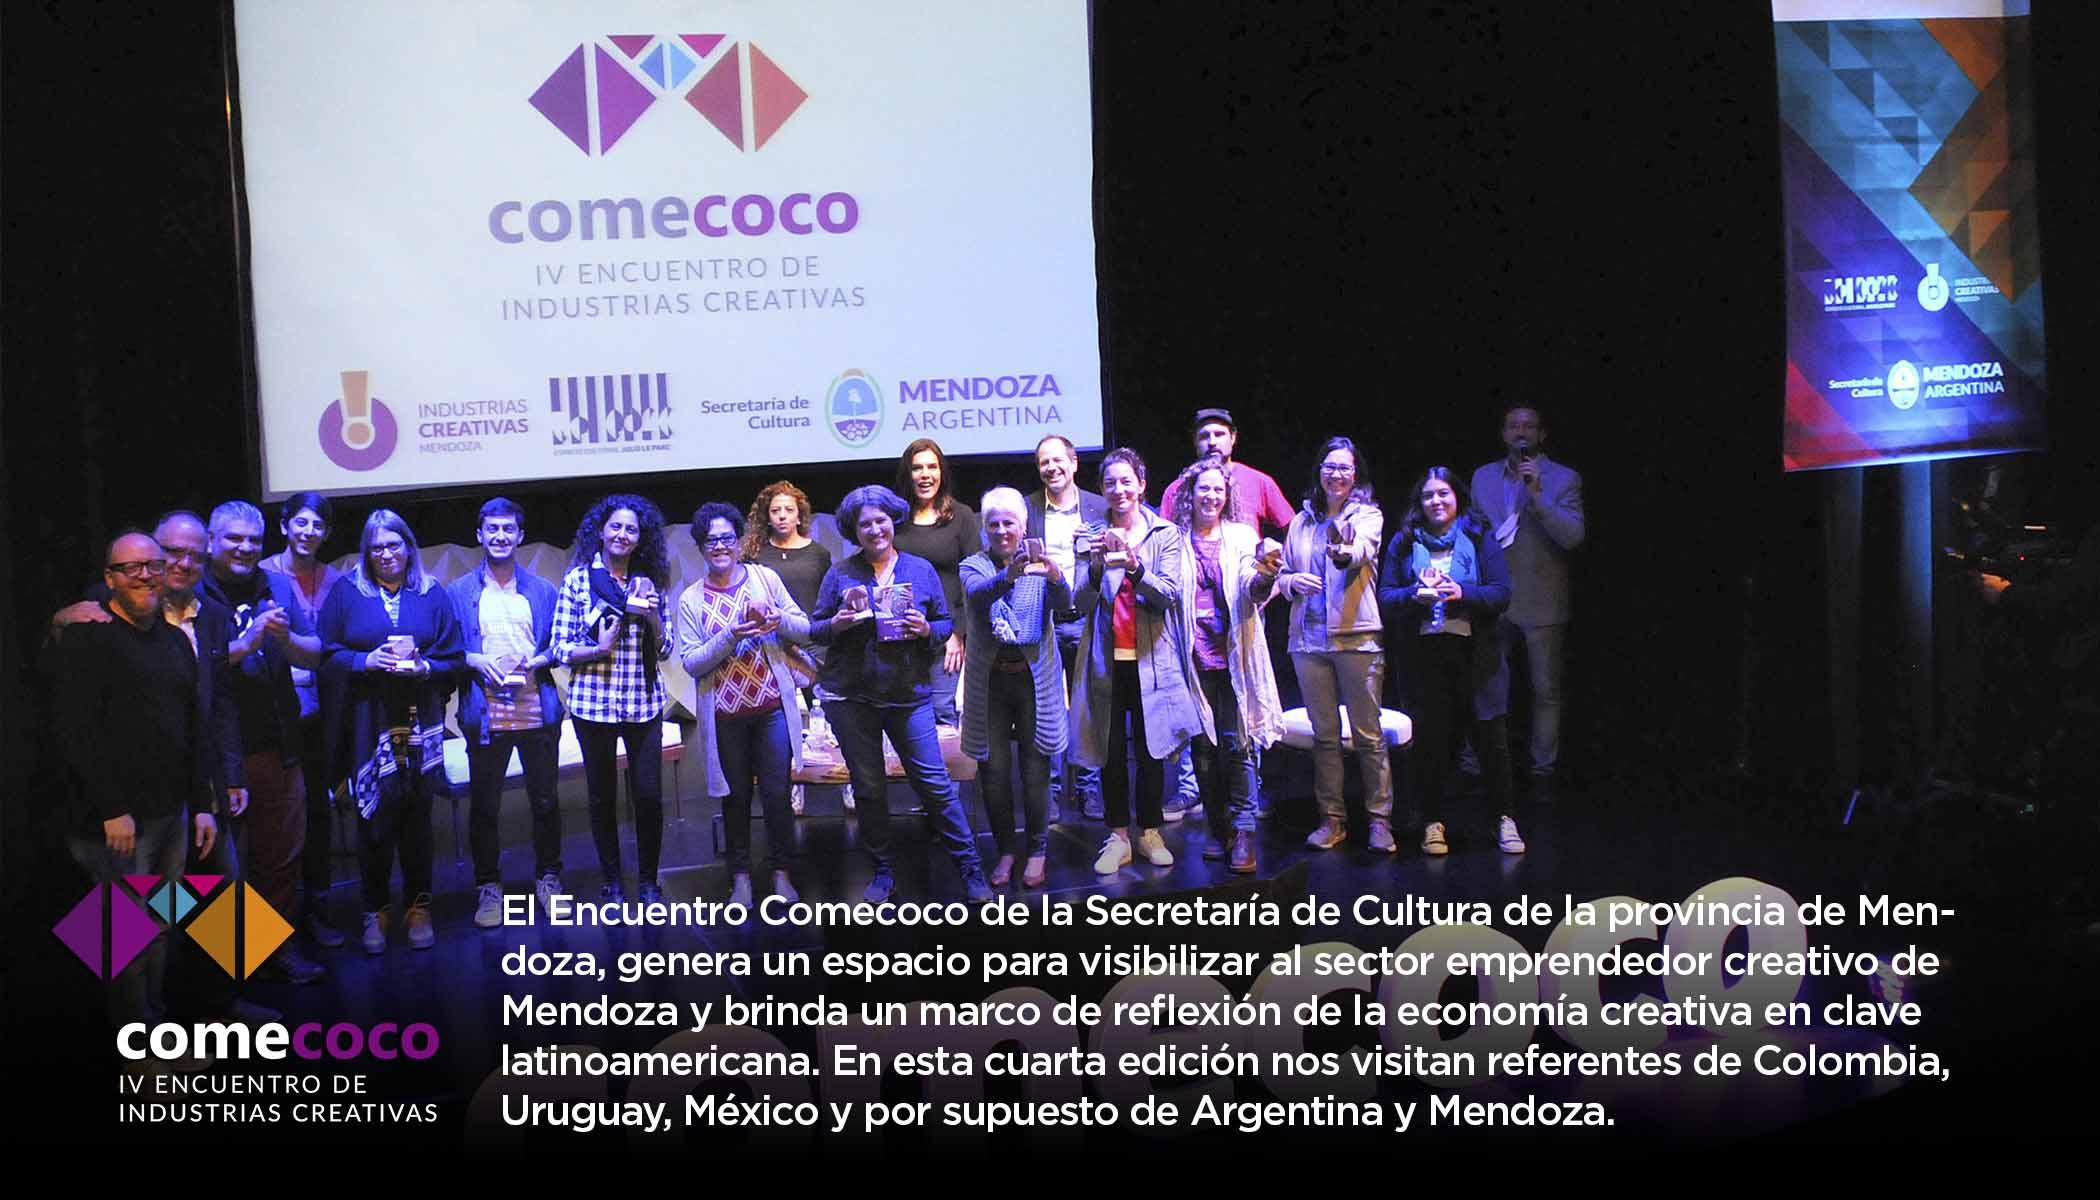 COMECOCO EN ACEQUIA 2019